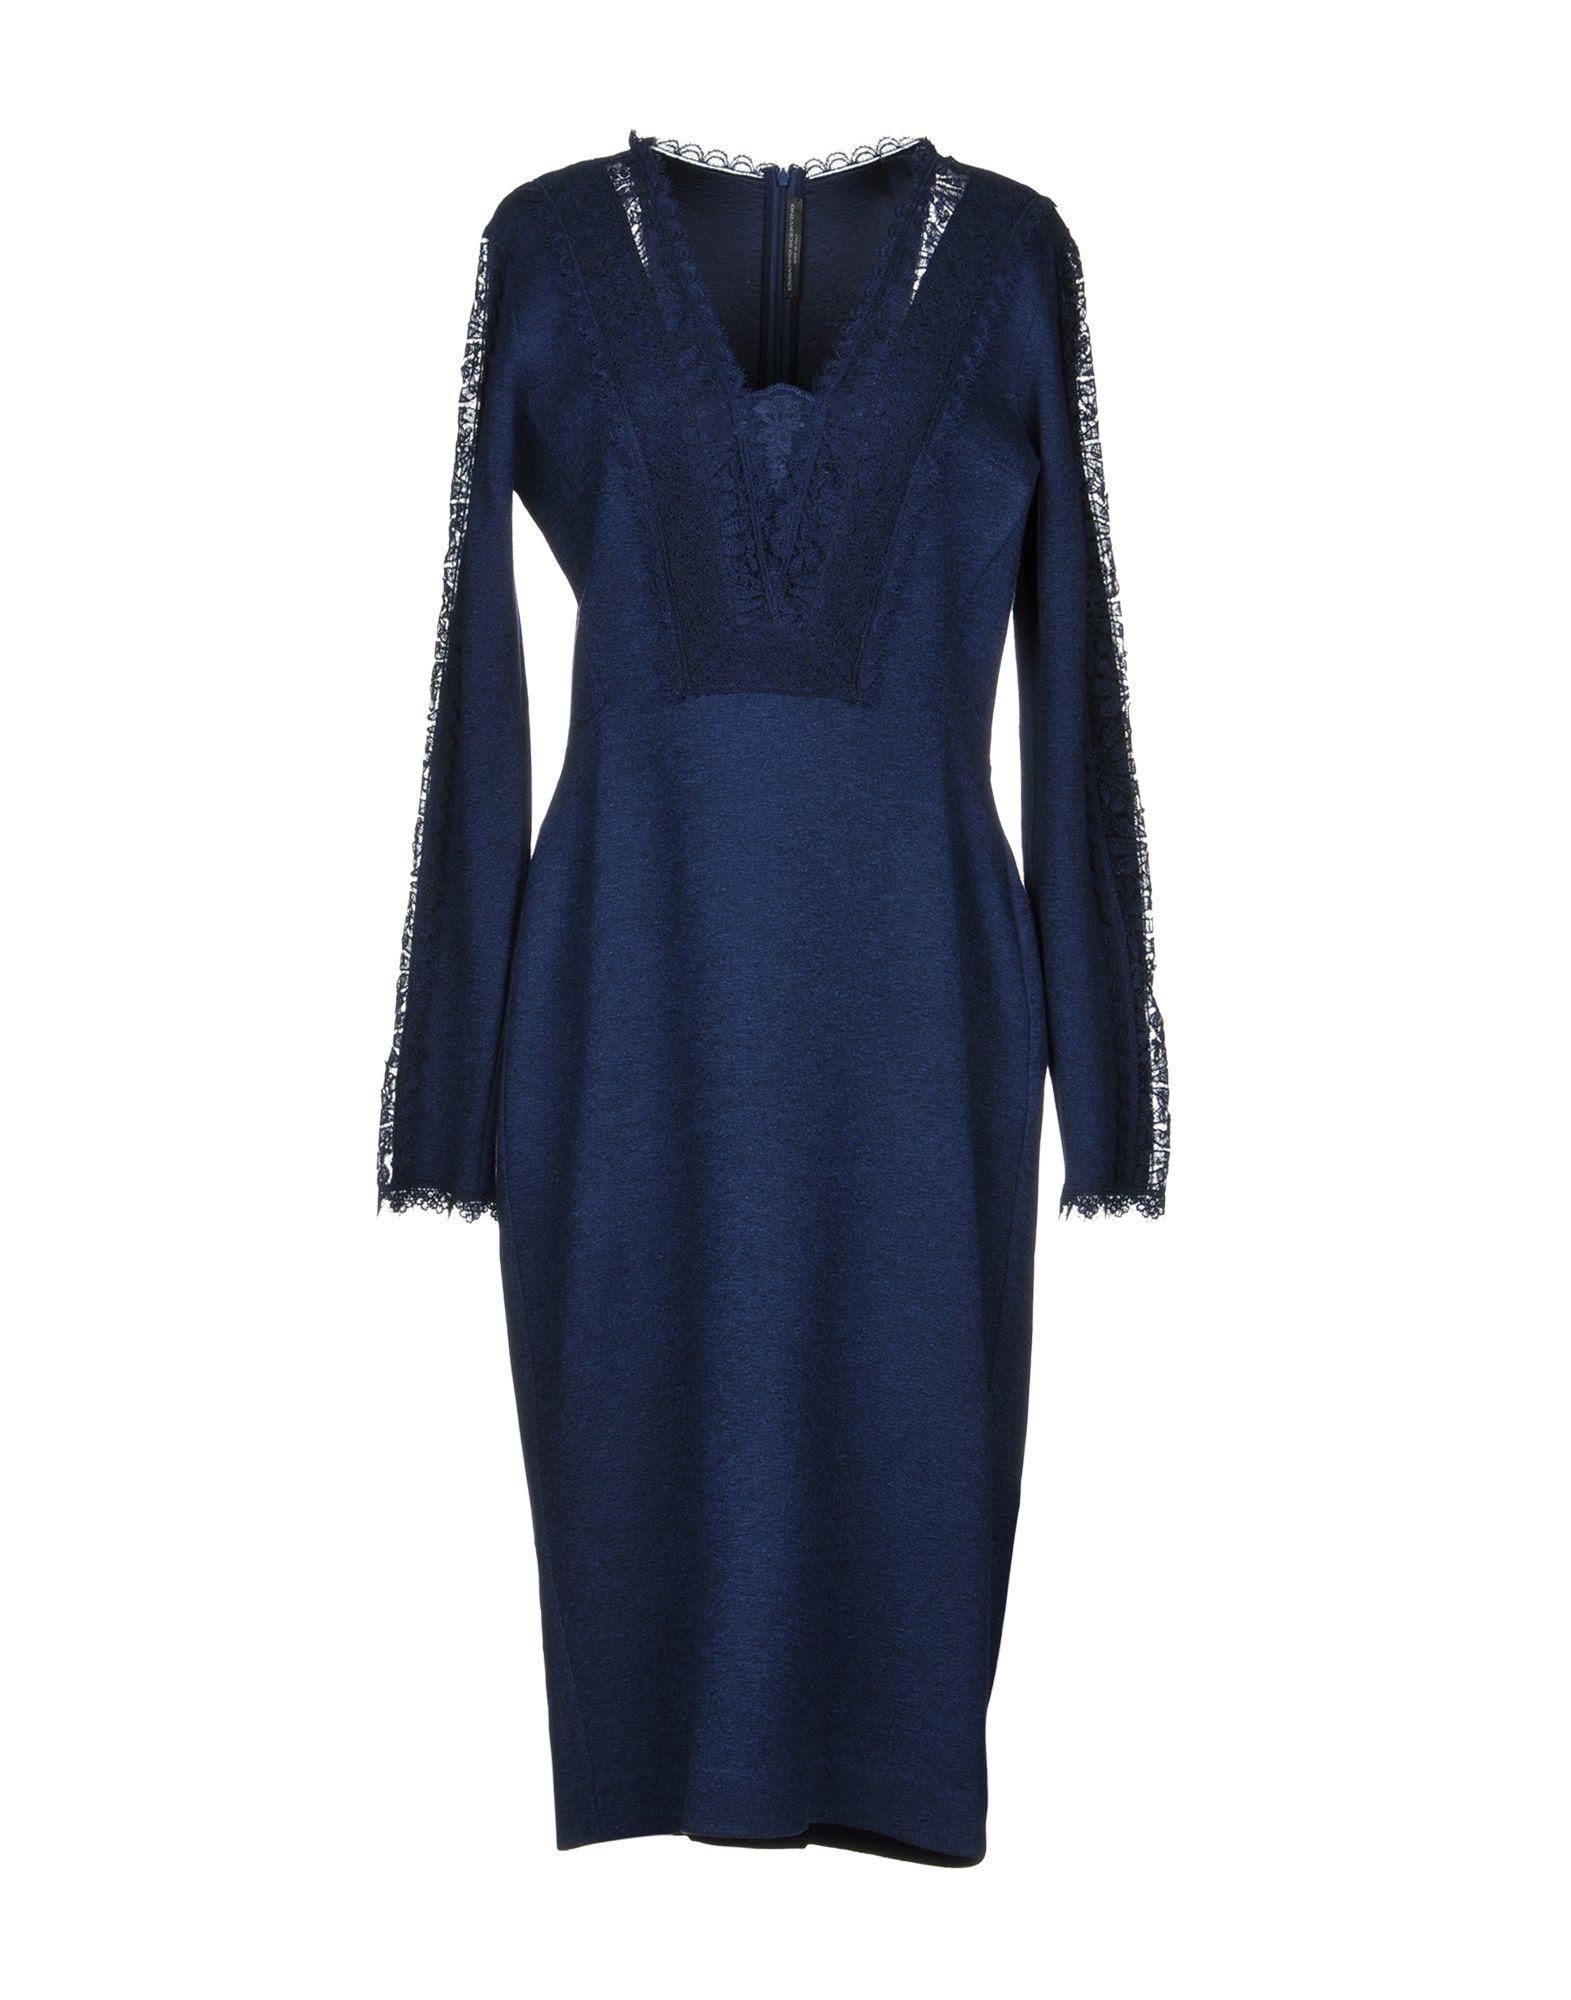 Ermanno Scervino Midi Dress In Dark Blue